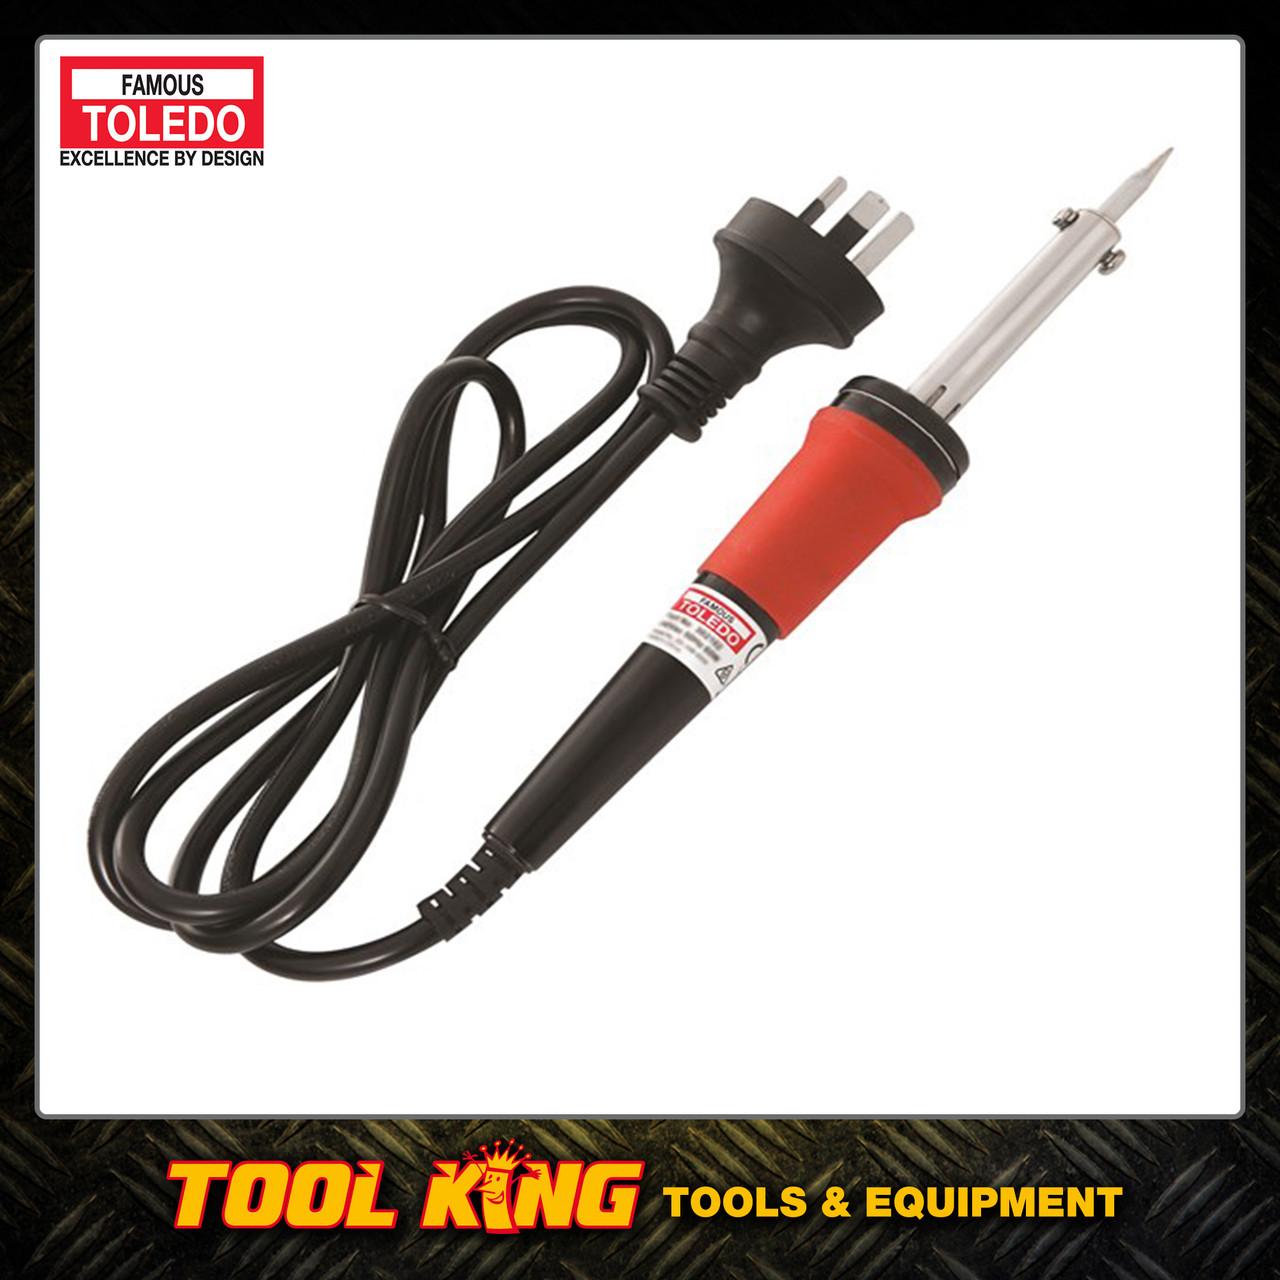 Soldering iron 40watt TOLEDO professional